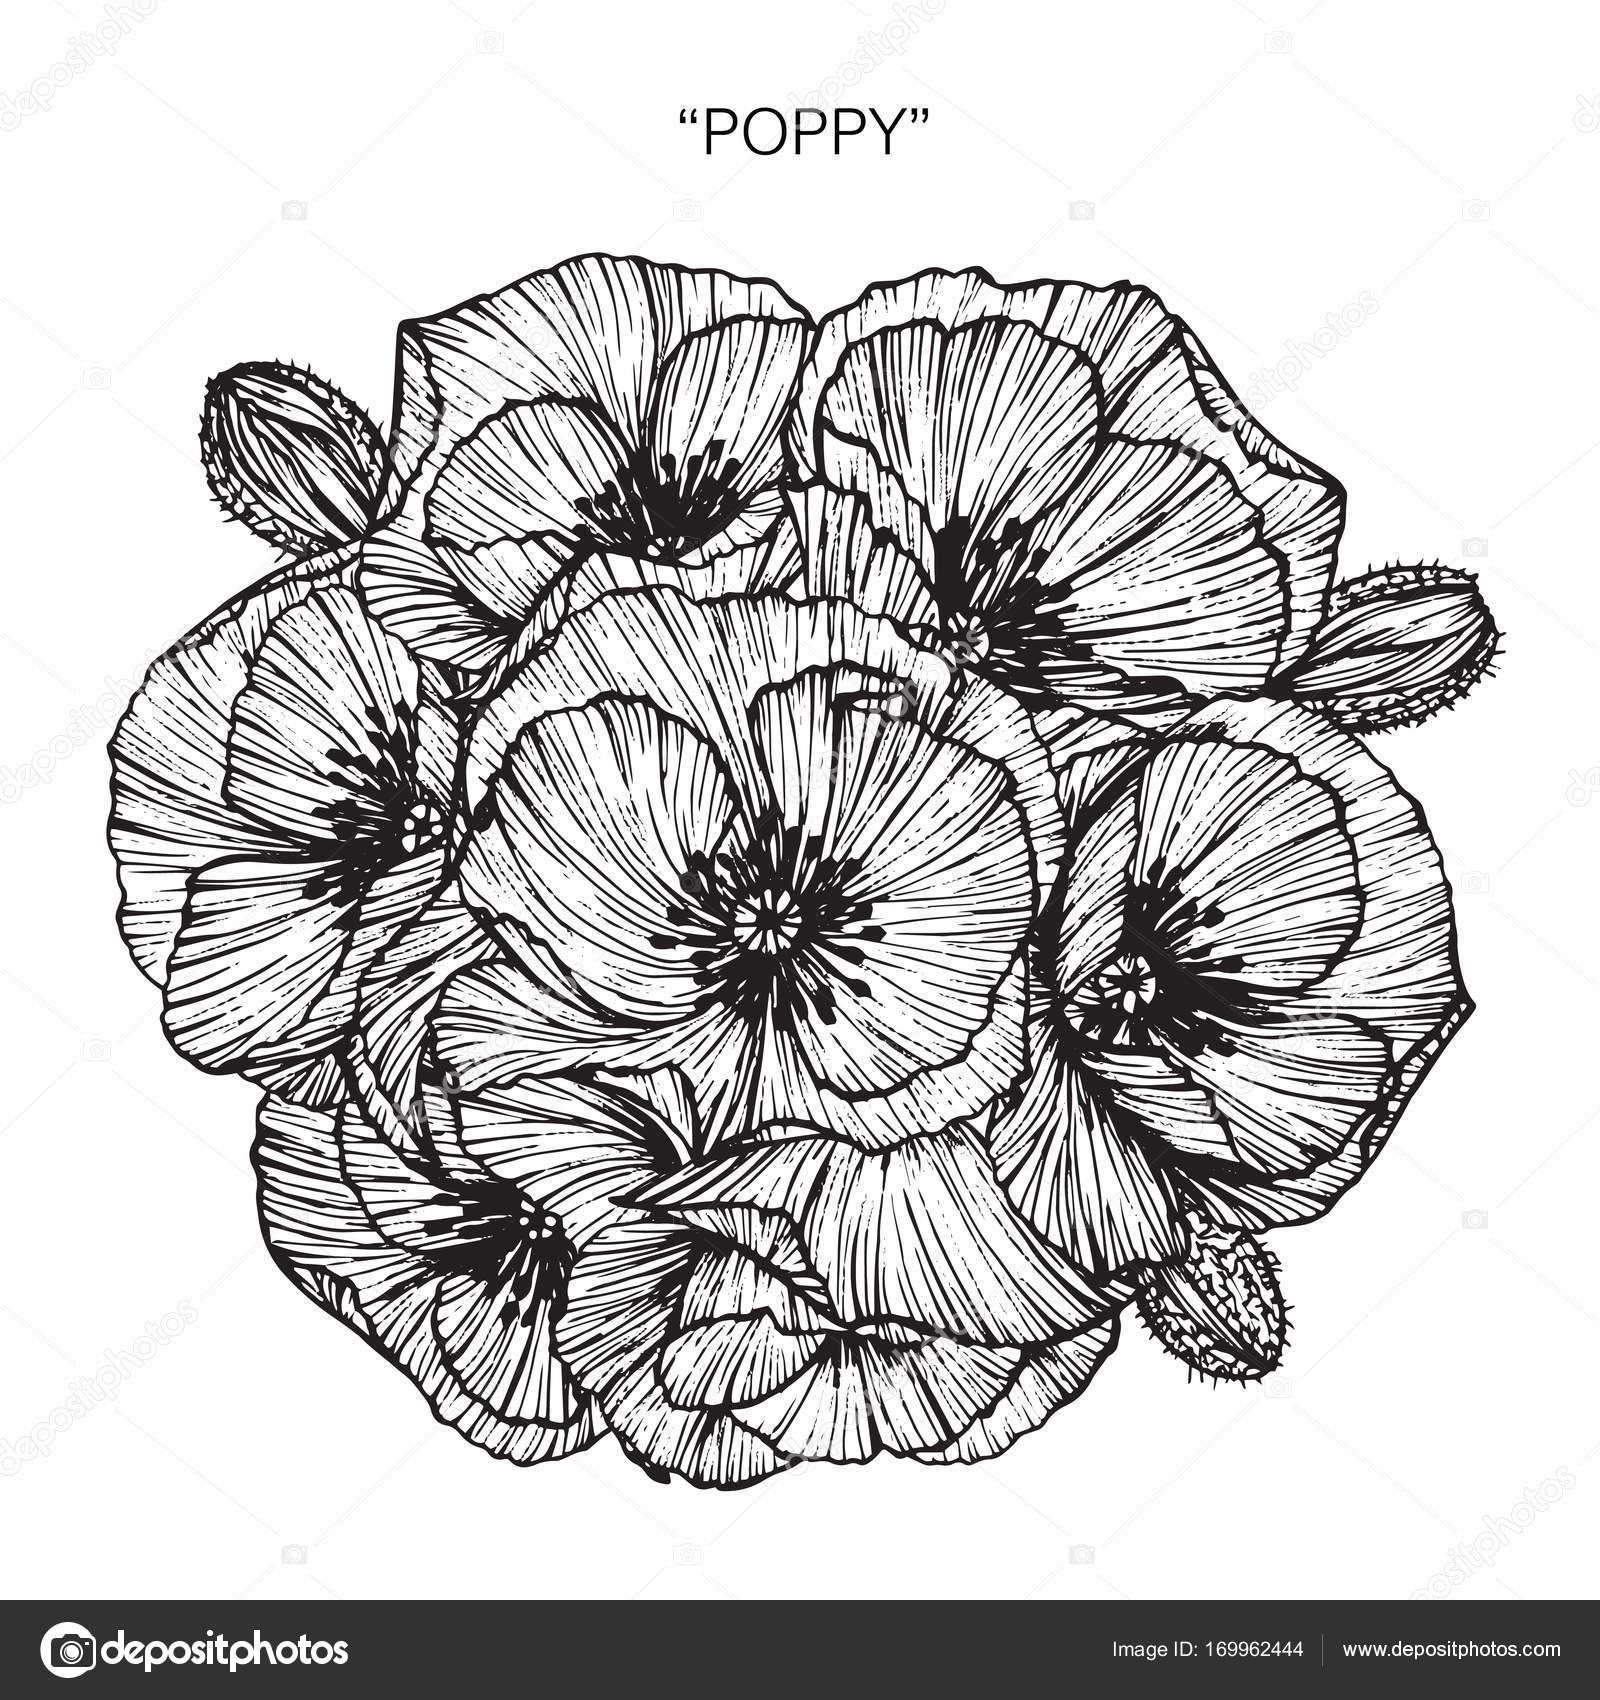 Bouquet of poppy flowers drawing stock vector suwi19 169962444 bouquet of poppy flowers drawing stock vector izmirmasajfo